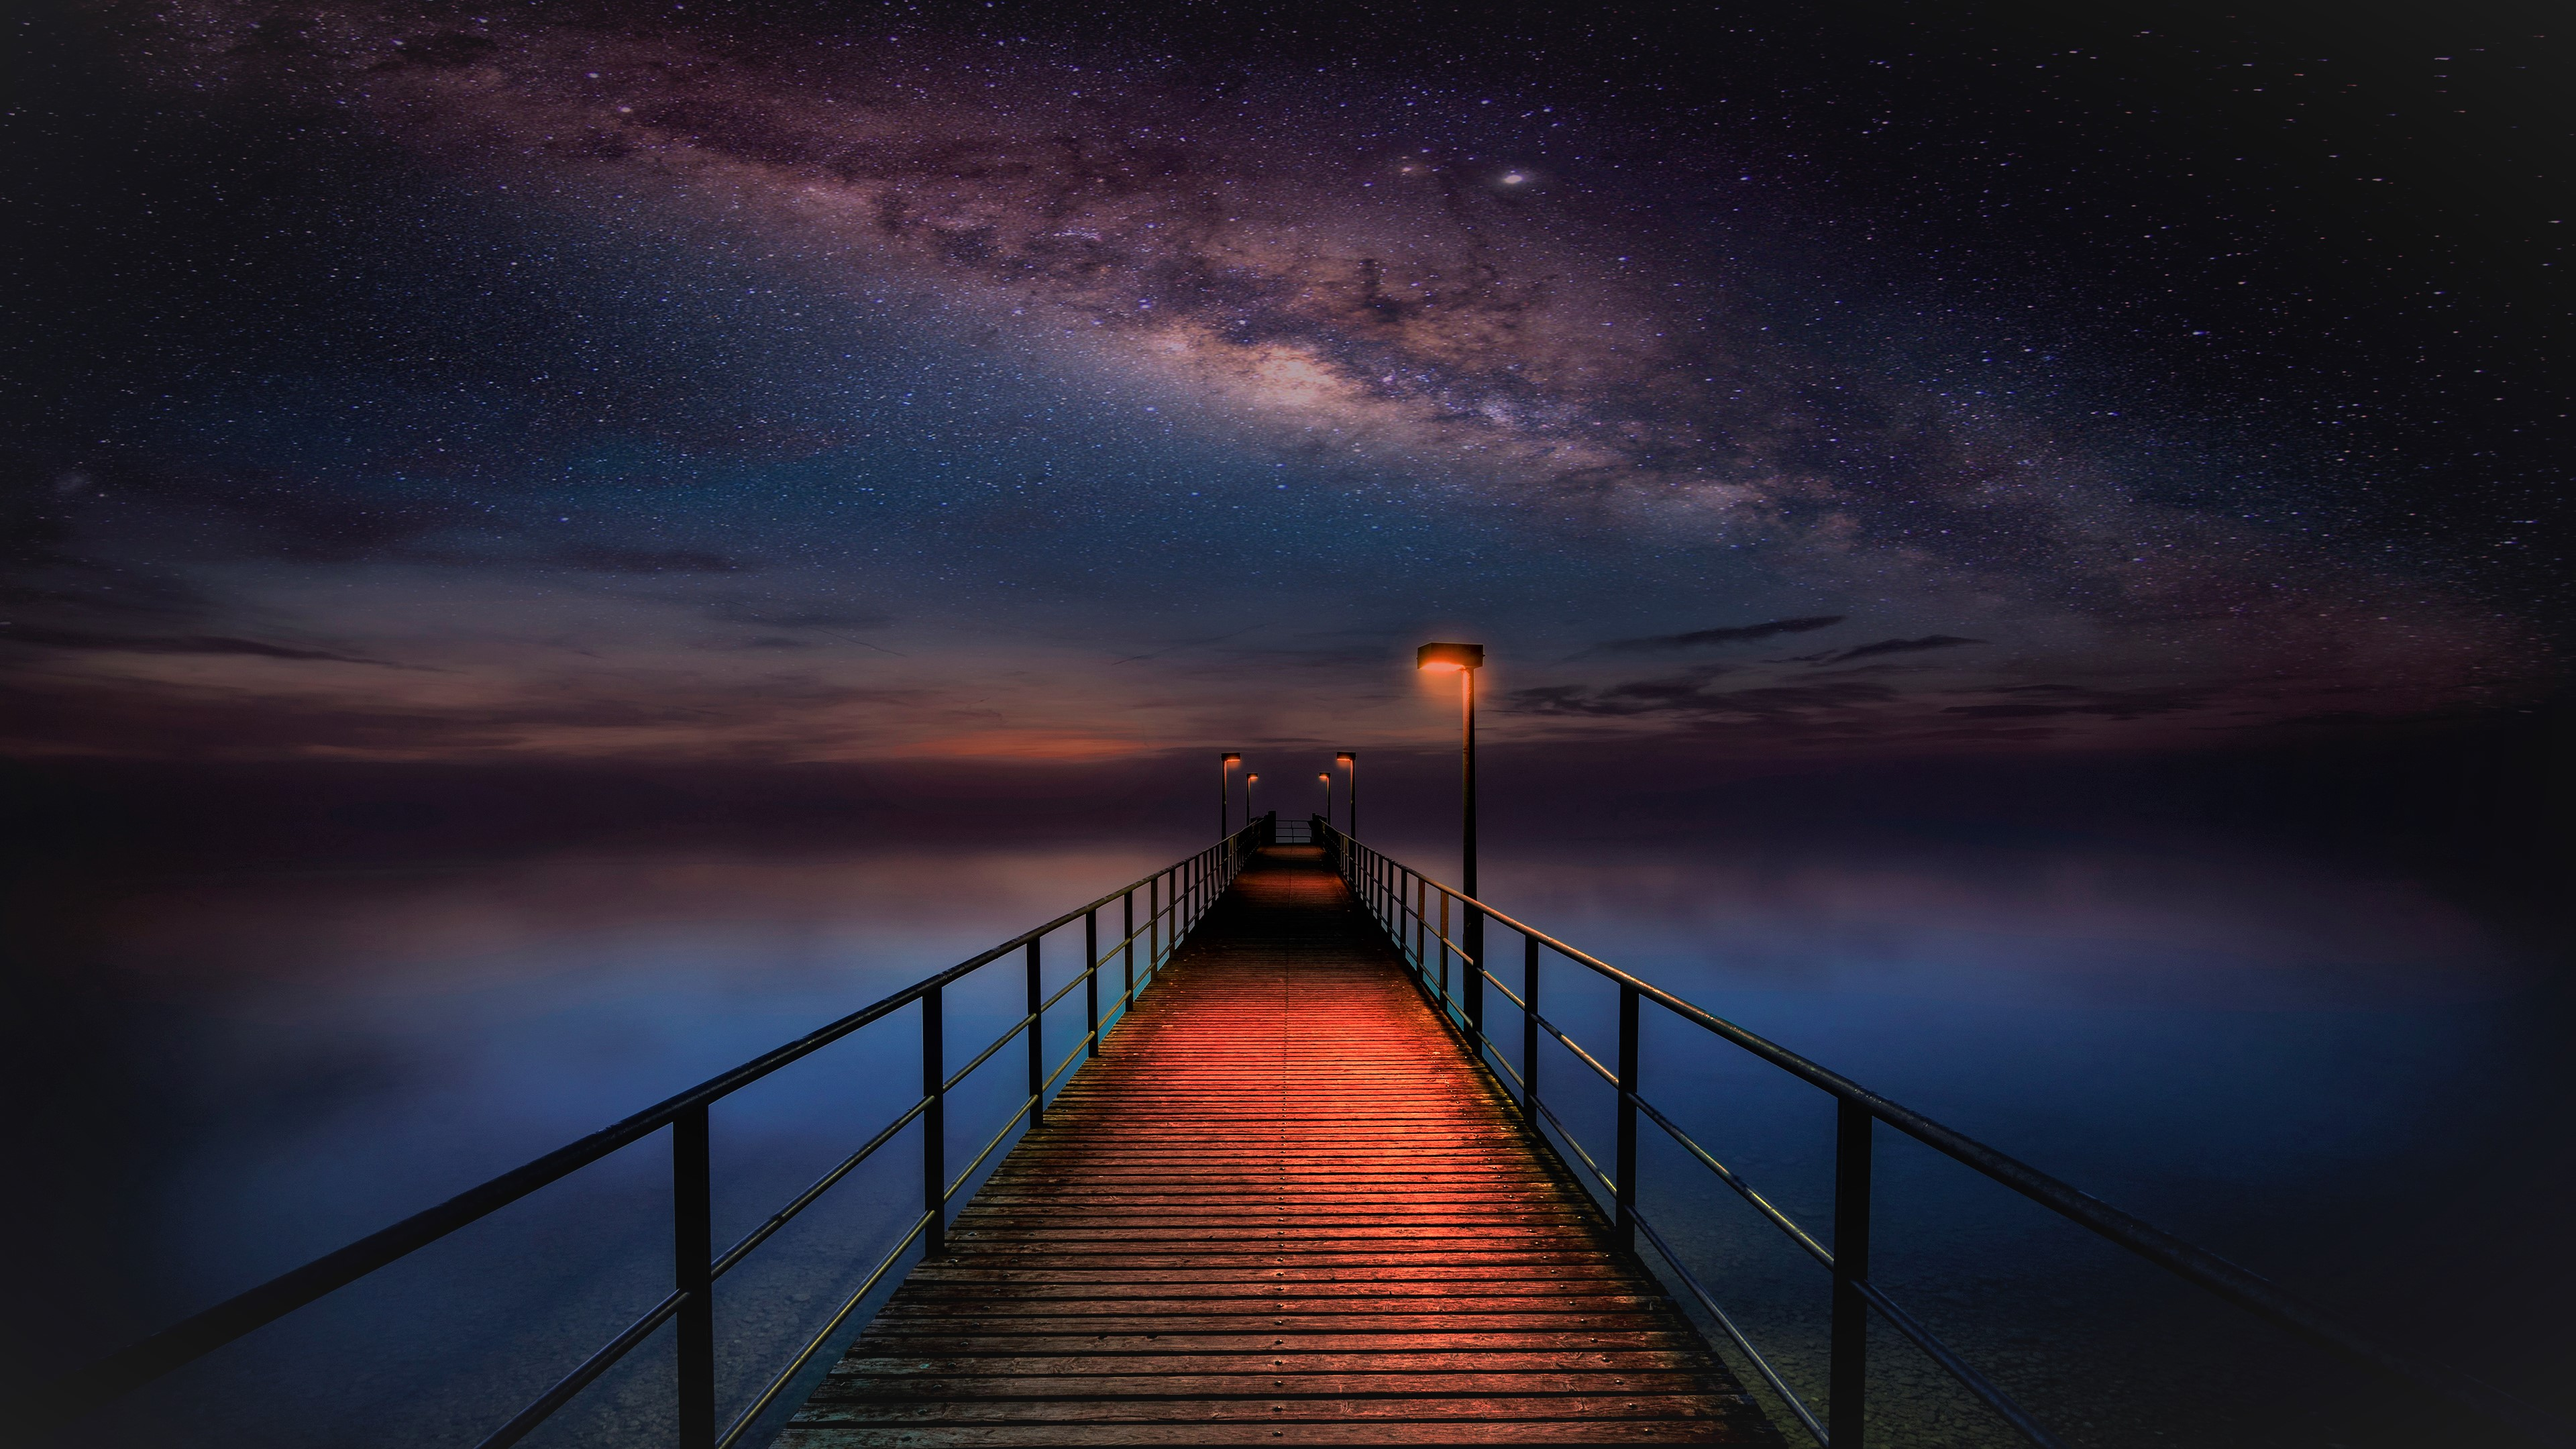 Ocean pier under milky way sky 4k ultra hd wallpaper for Night sky wallpaper 4k